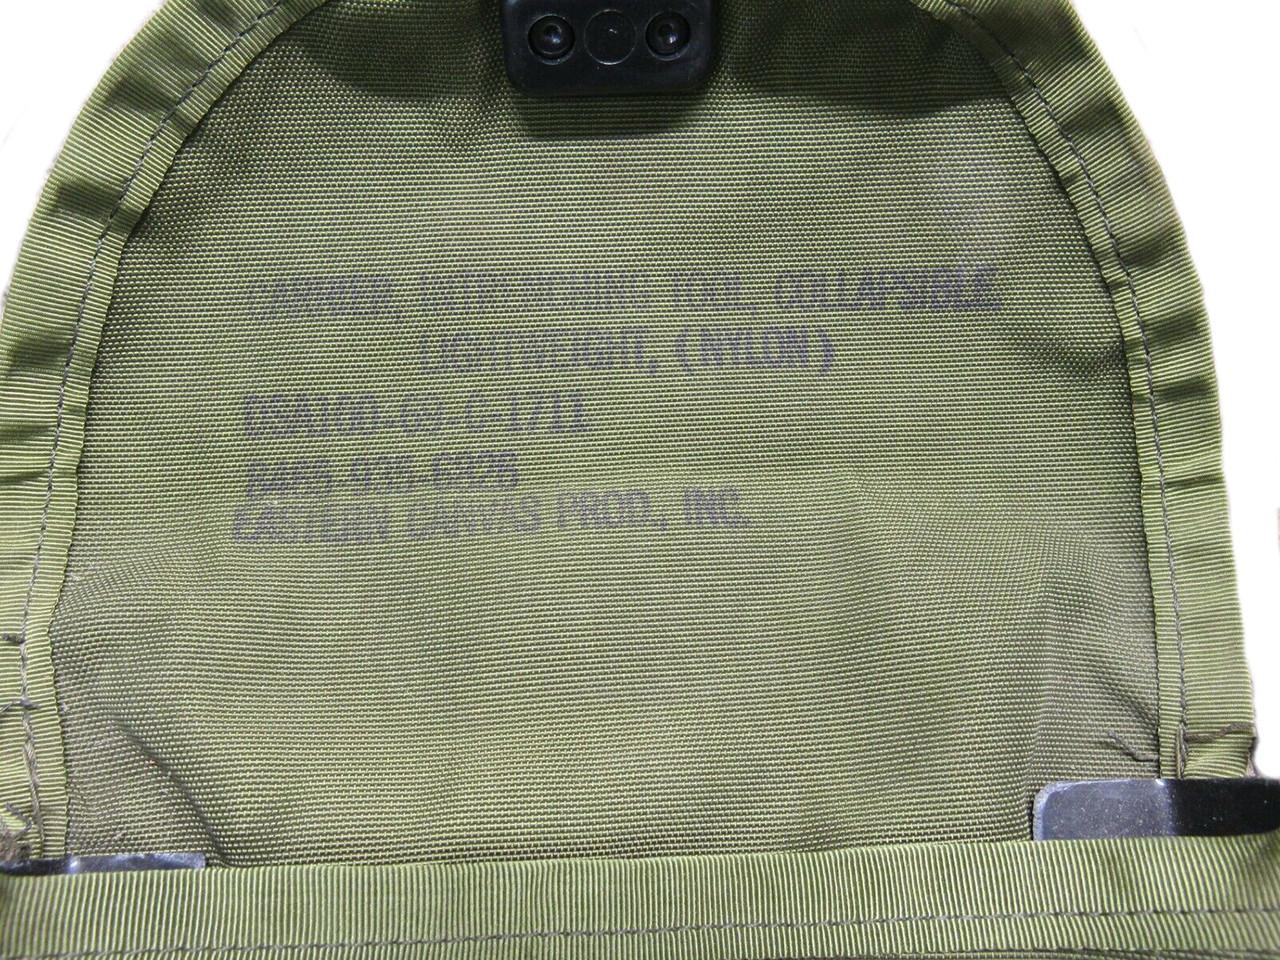 Vietnam Era ALICE Gear E-Tool Cover